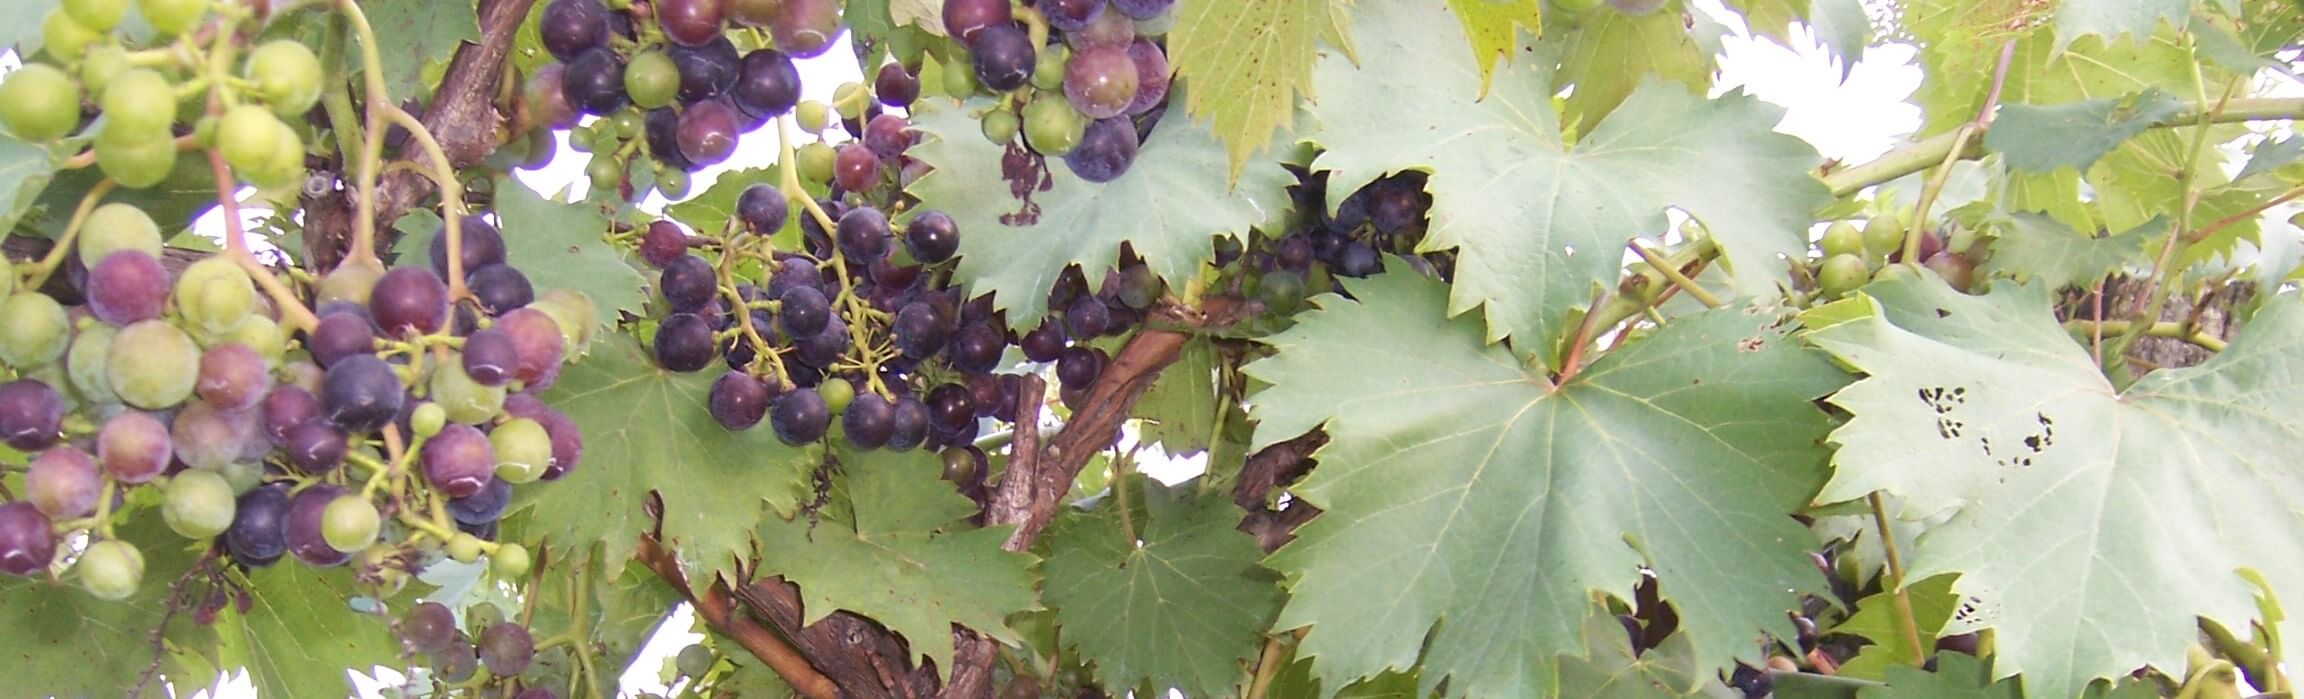 West Whitehill Grapes.JPG